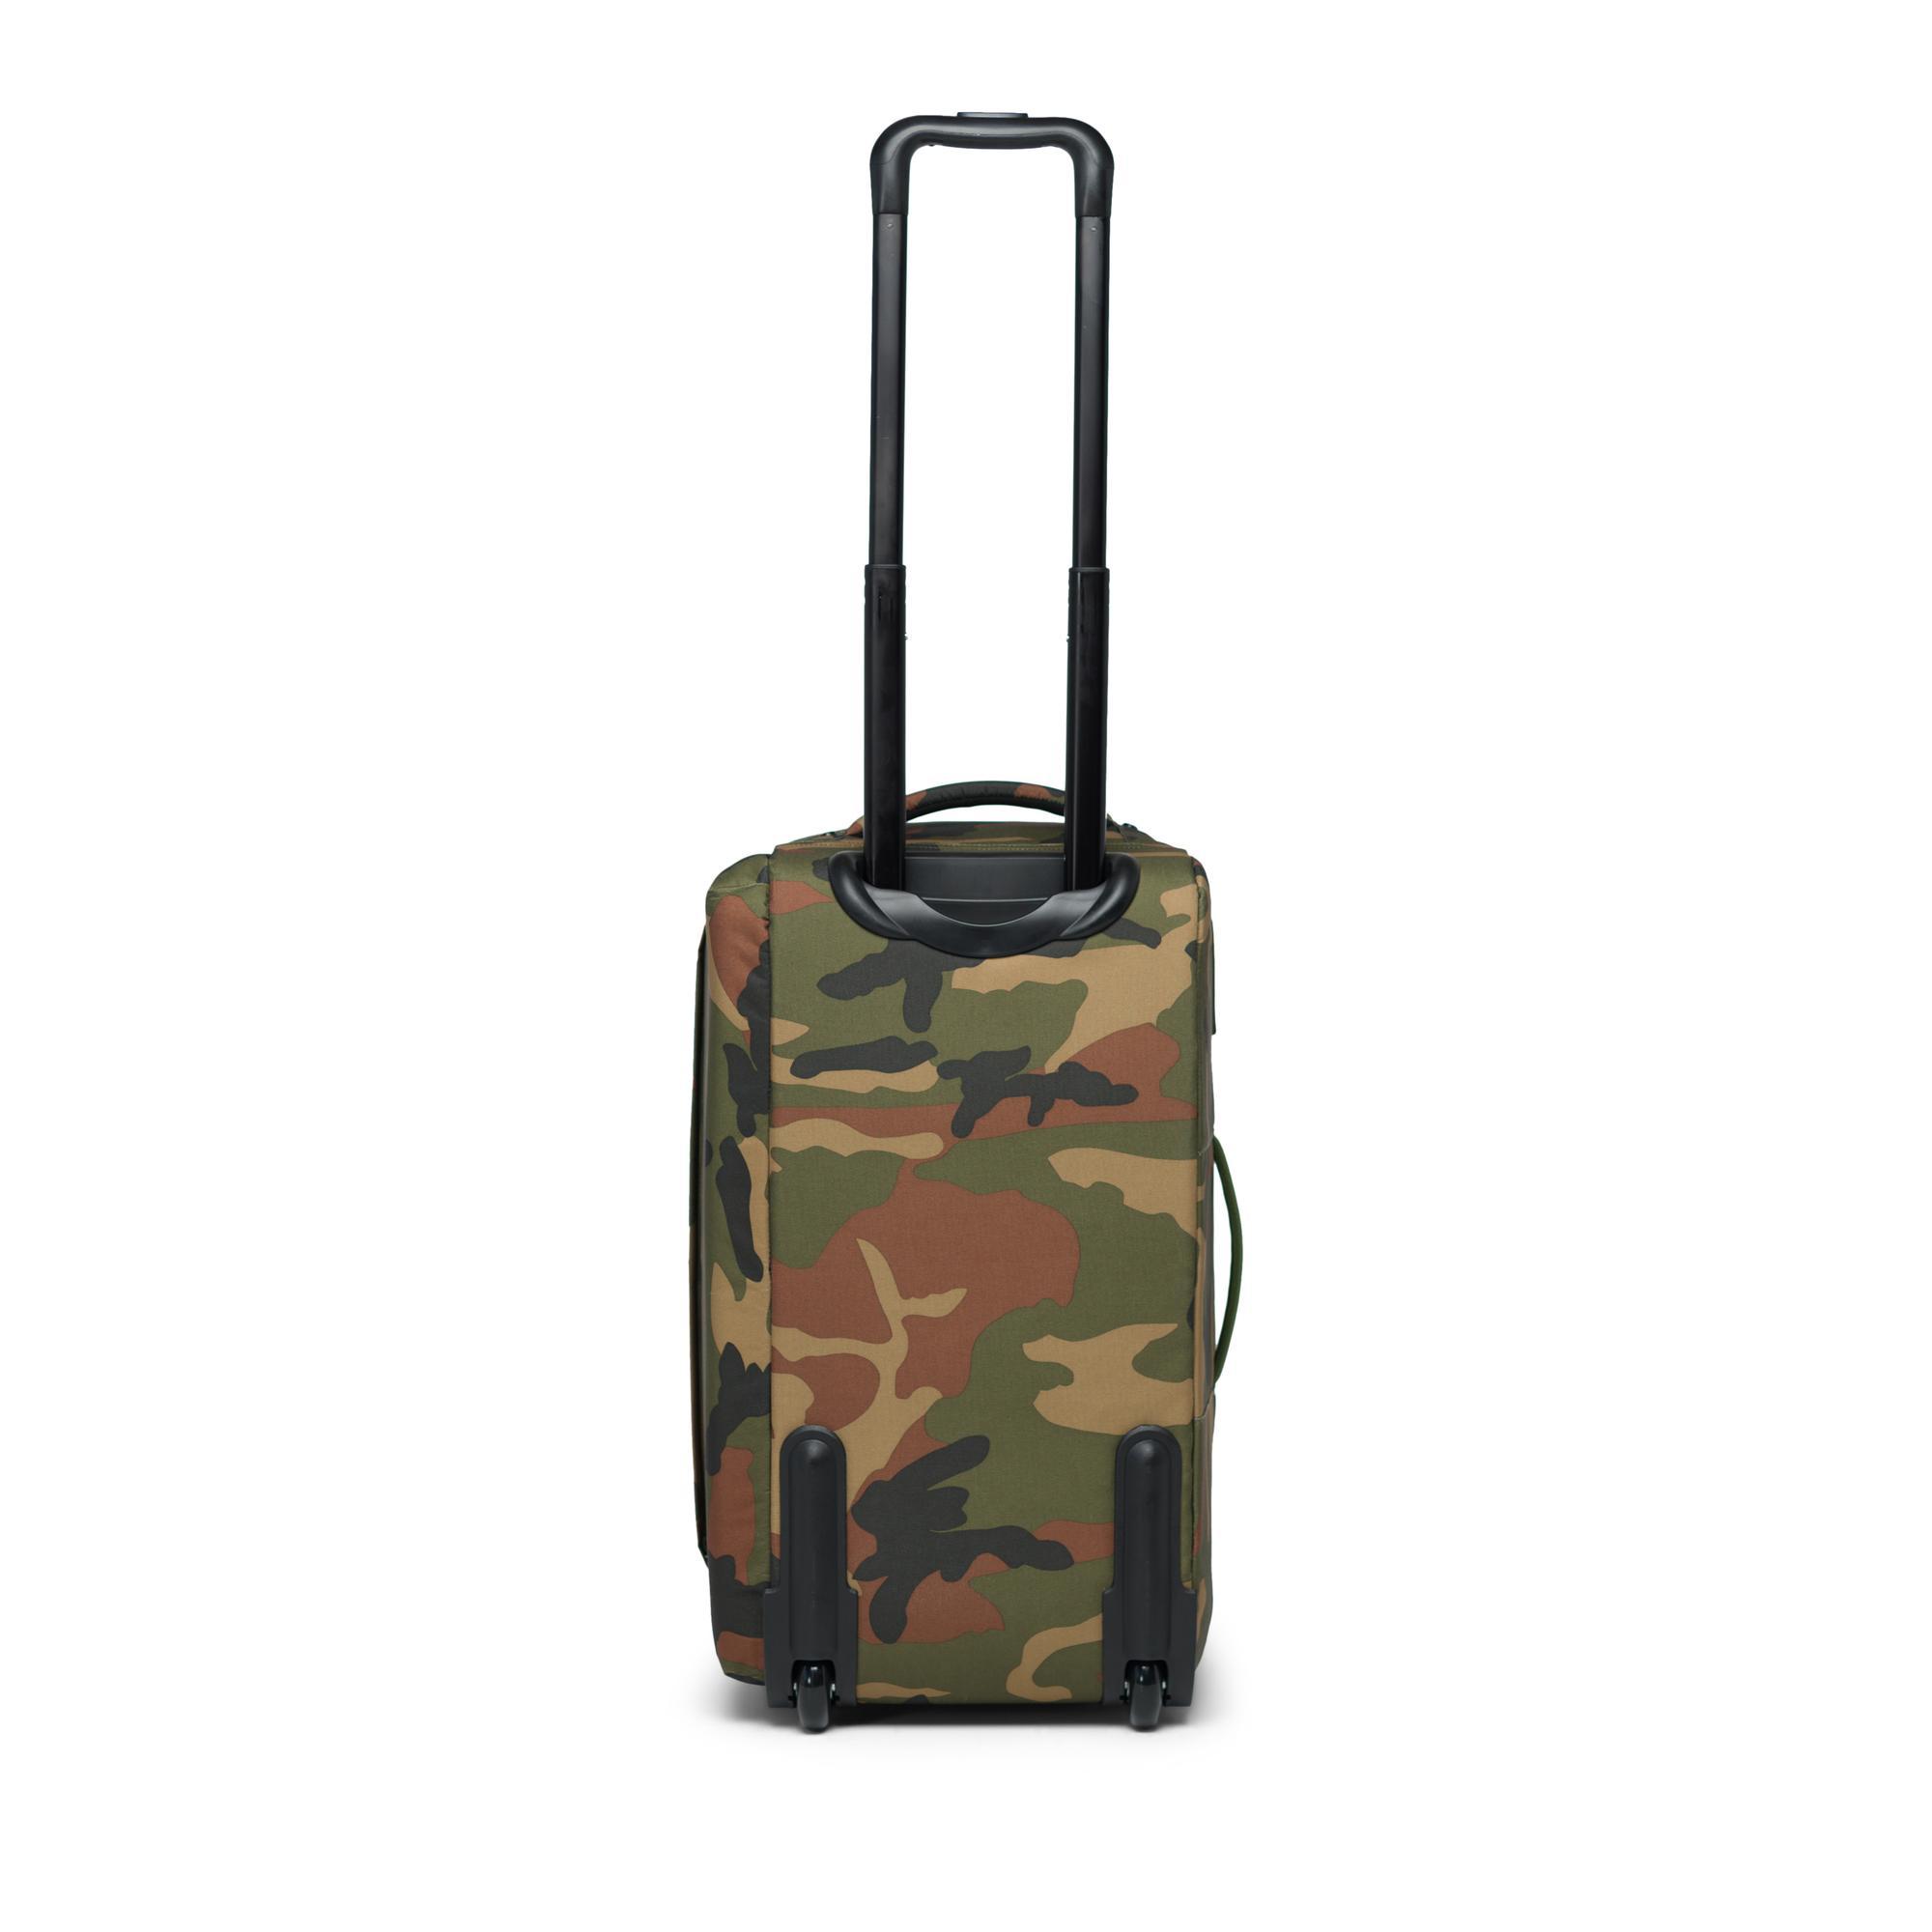 af2eeff19ec Outfitter Wheelie Luggage 50L   Herschel Supply Company